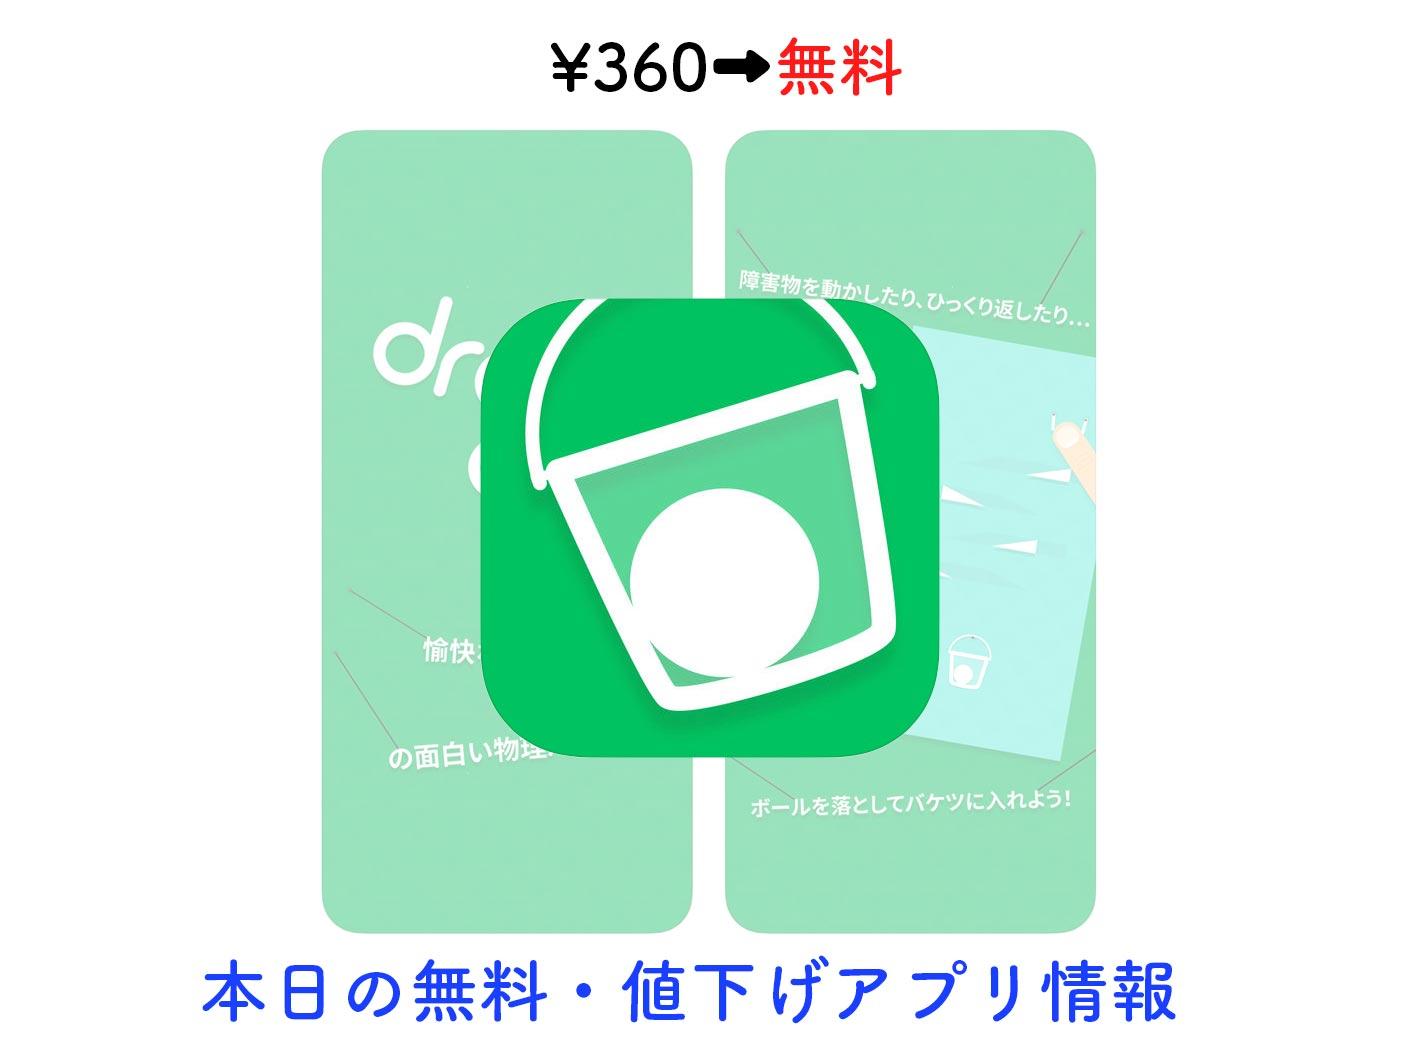 Appsale0820